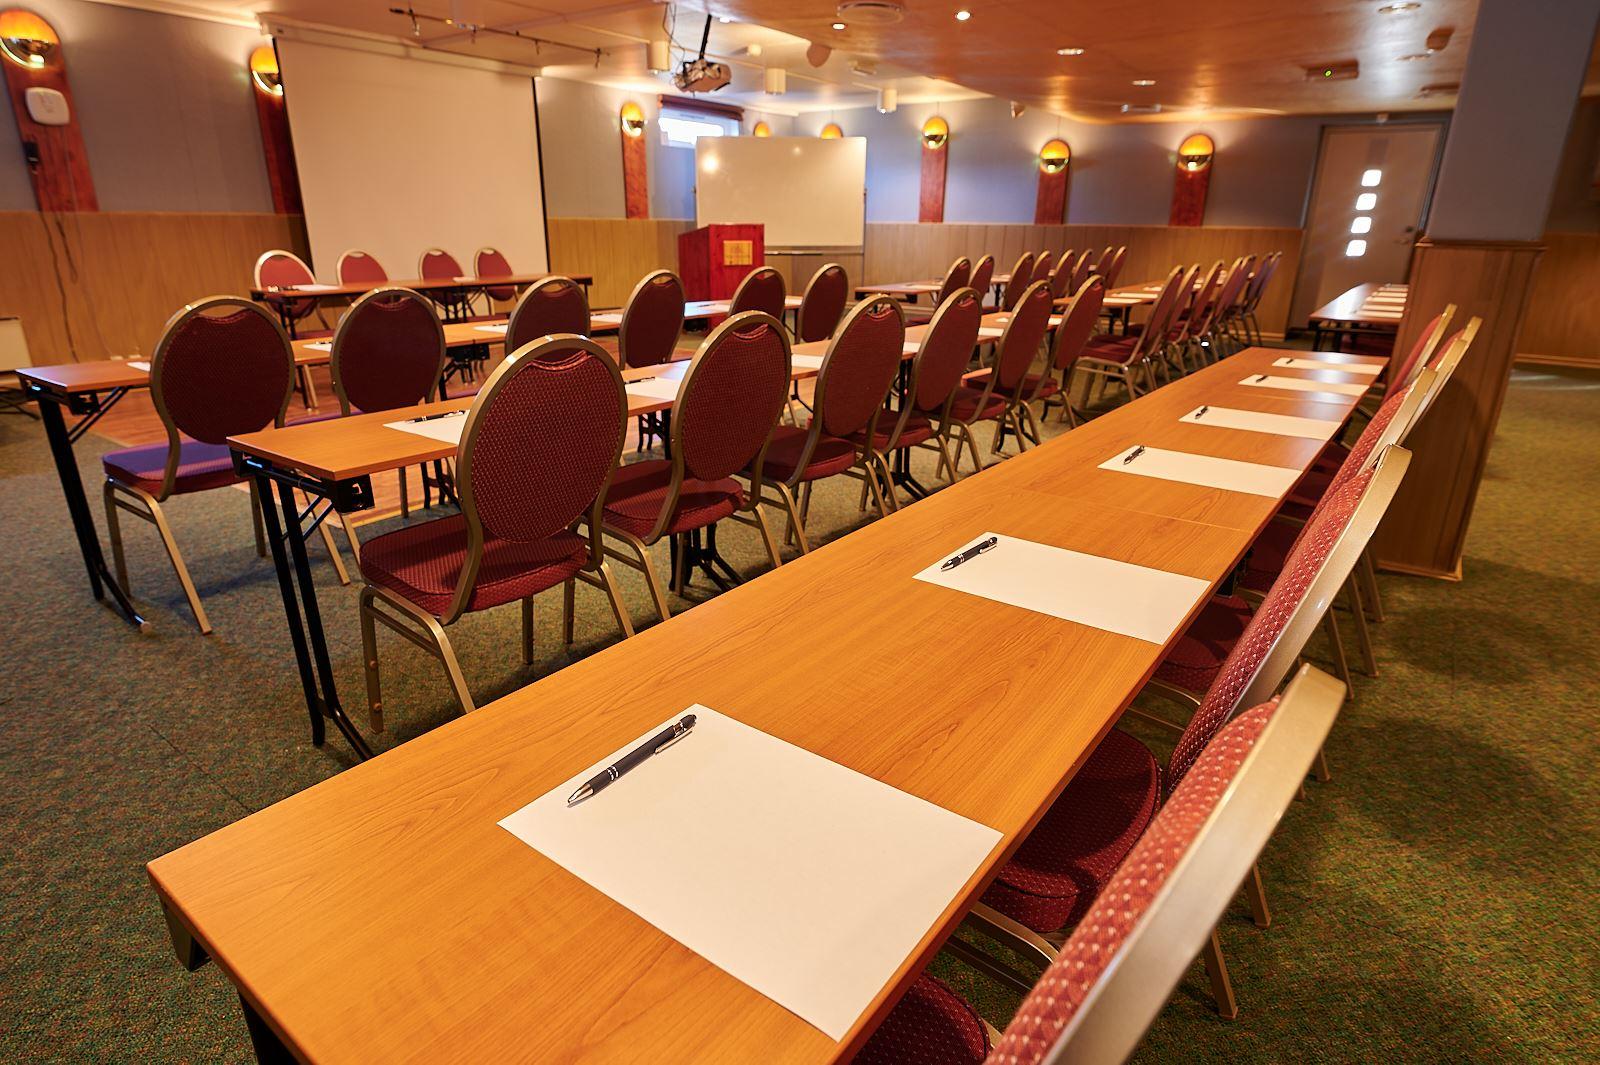 Jørn Holm Foto & Video,  © Jørn Holm Foto & Video, Reisafjord Hotel